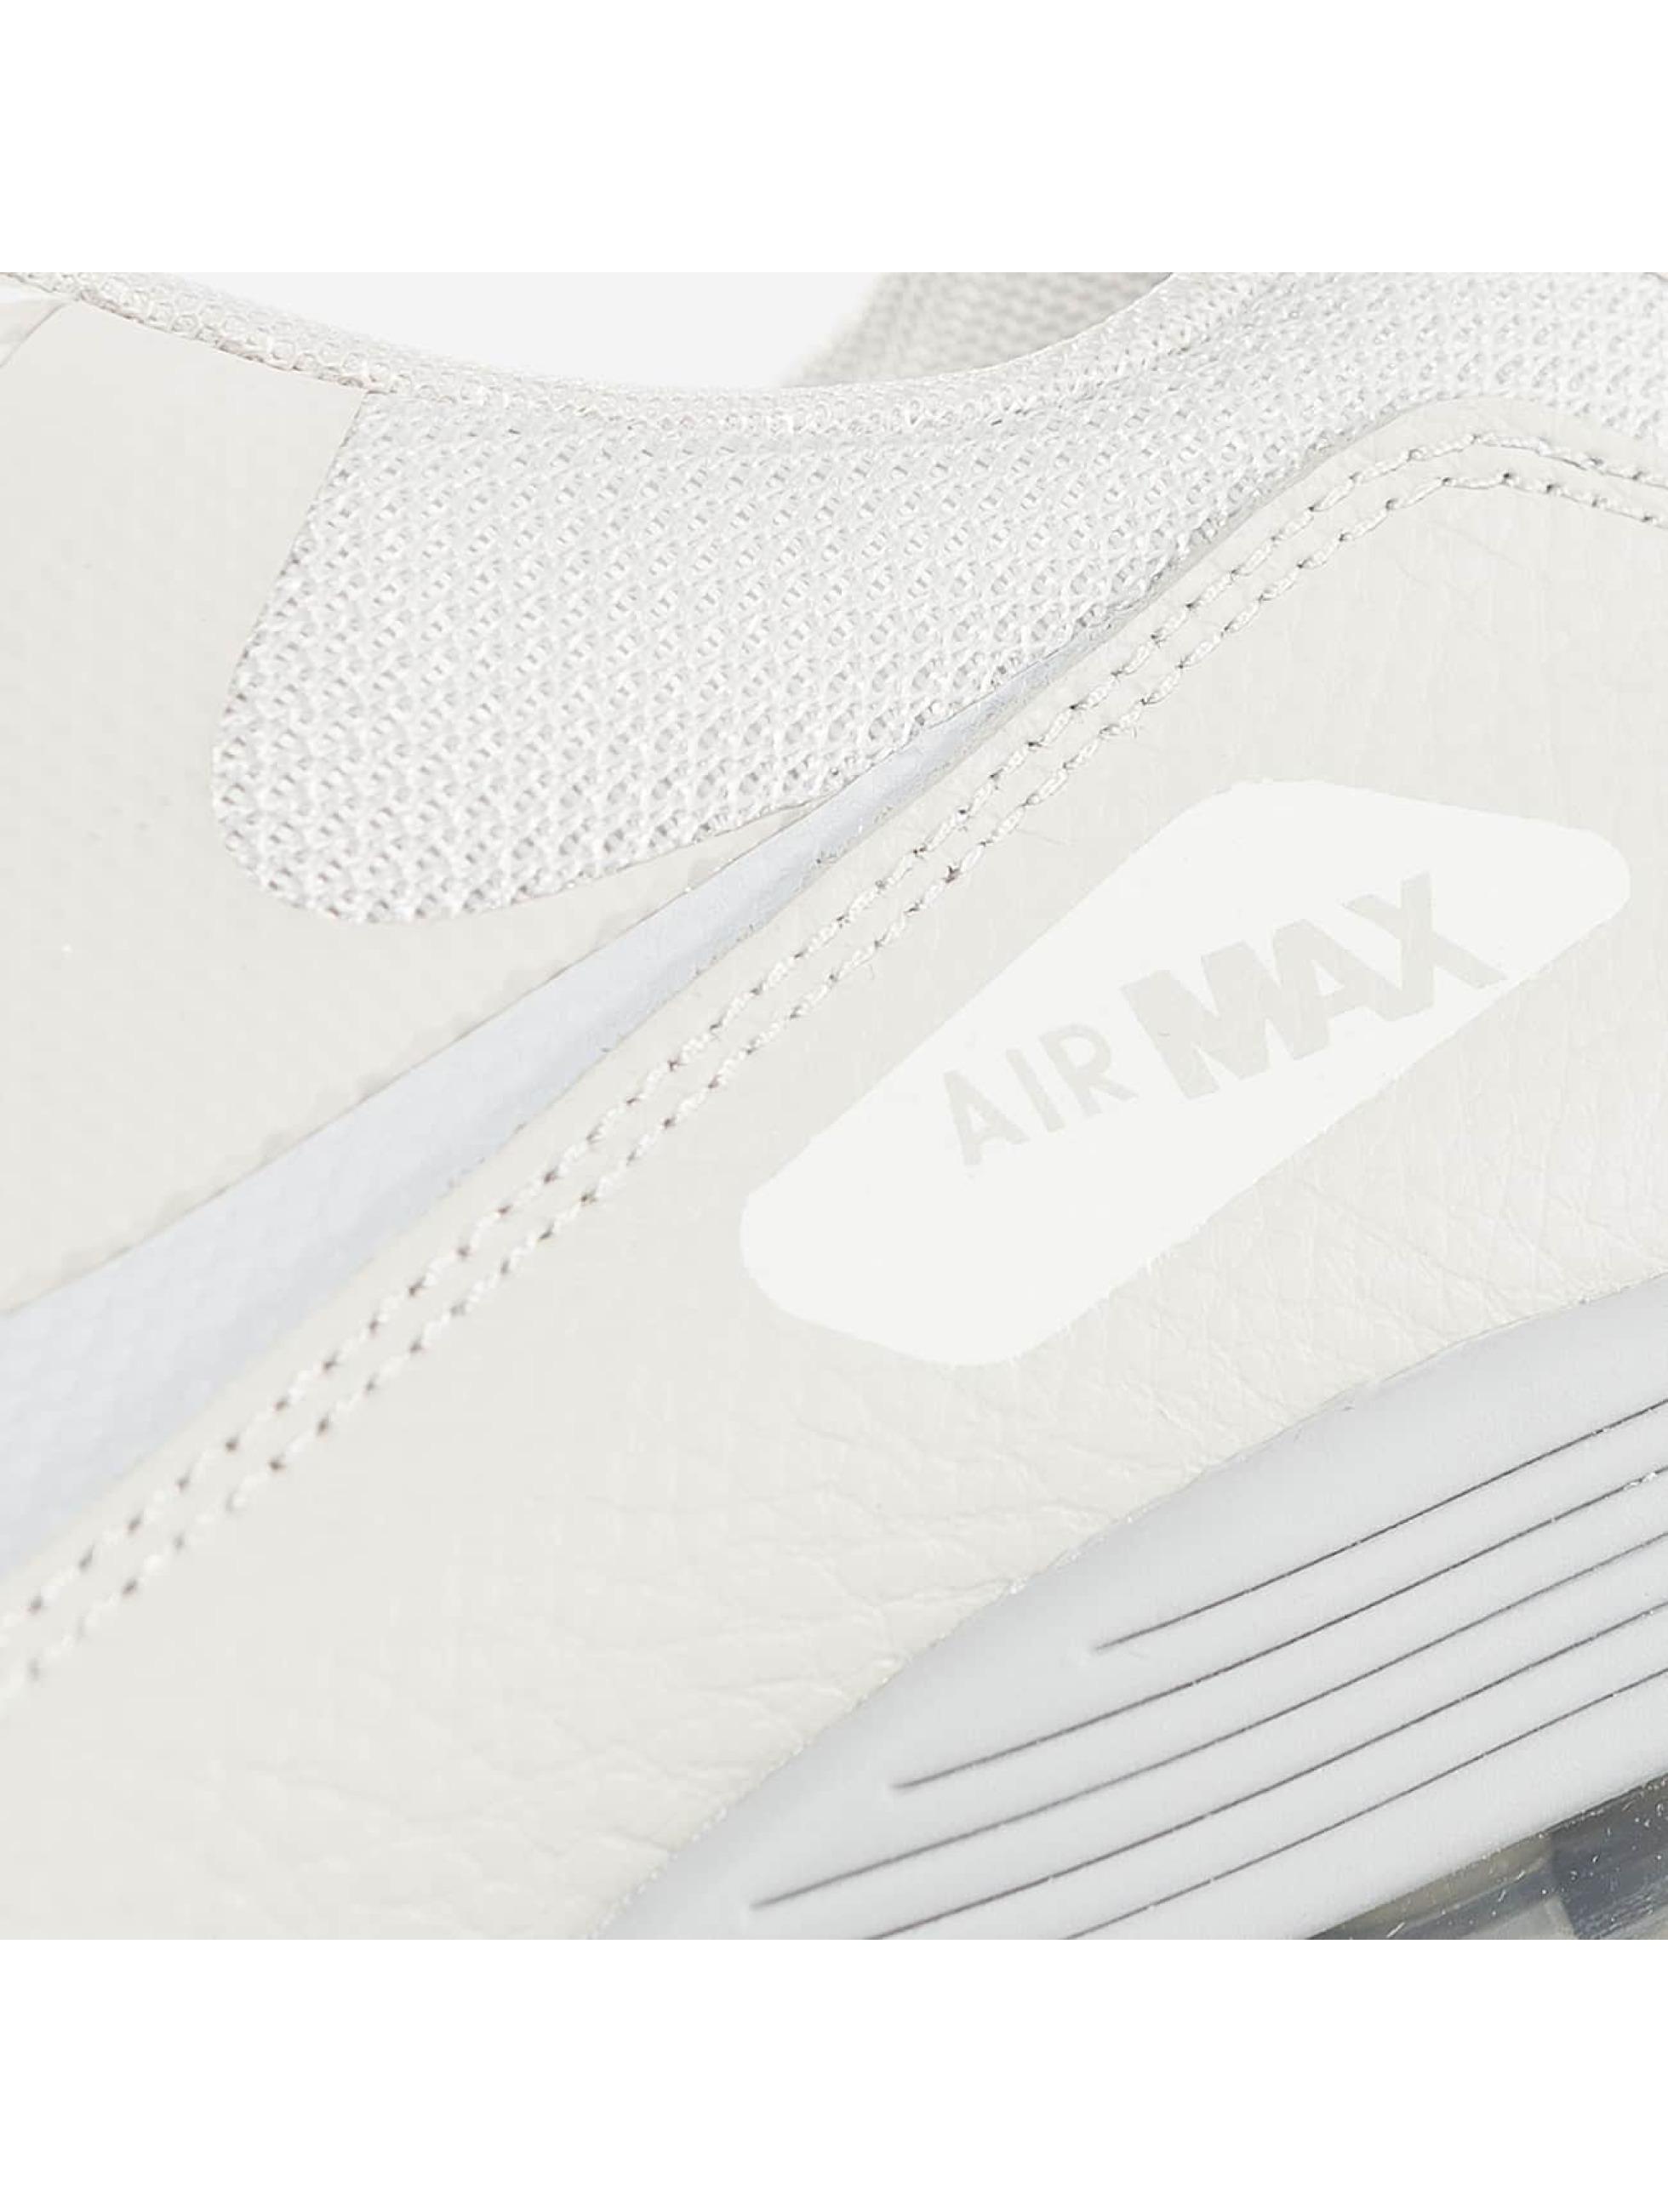 Nike Sneakers W Air Max 90 Ultra 2.0 grey